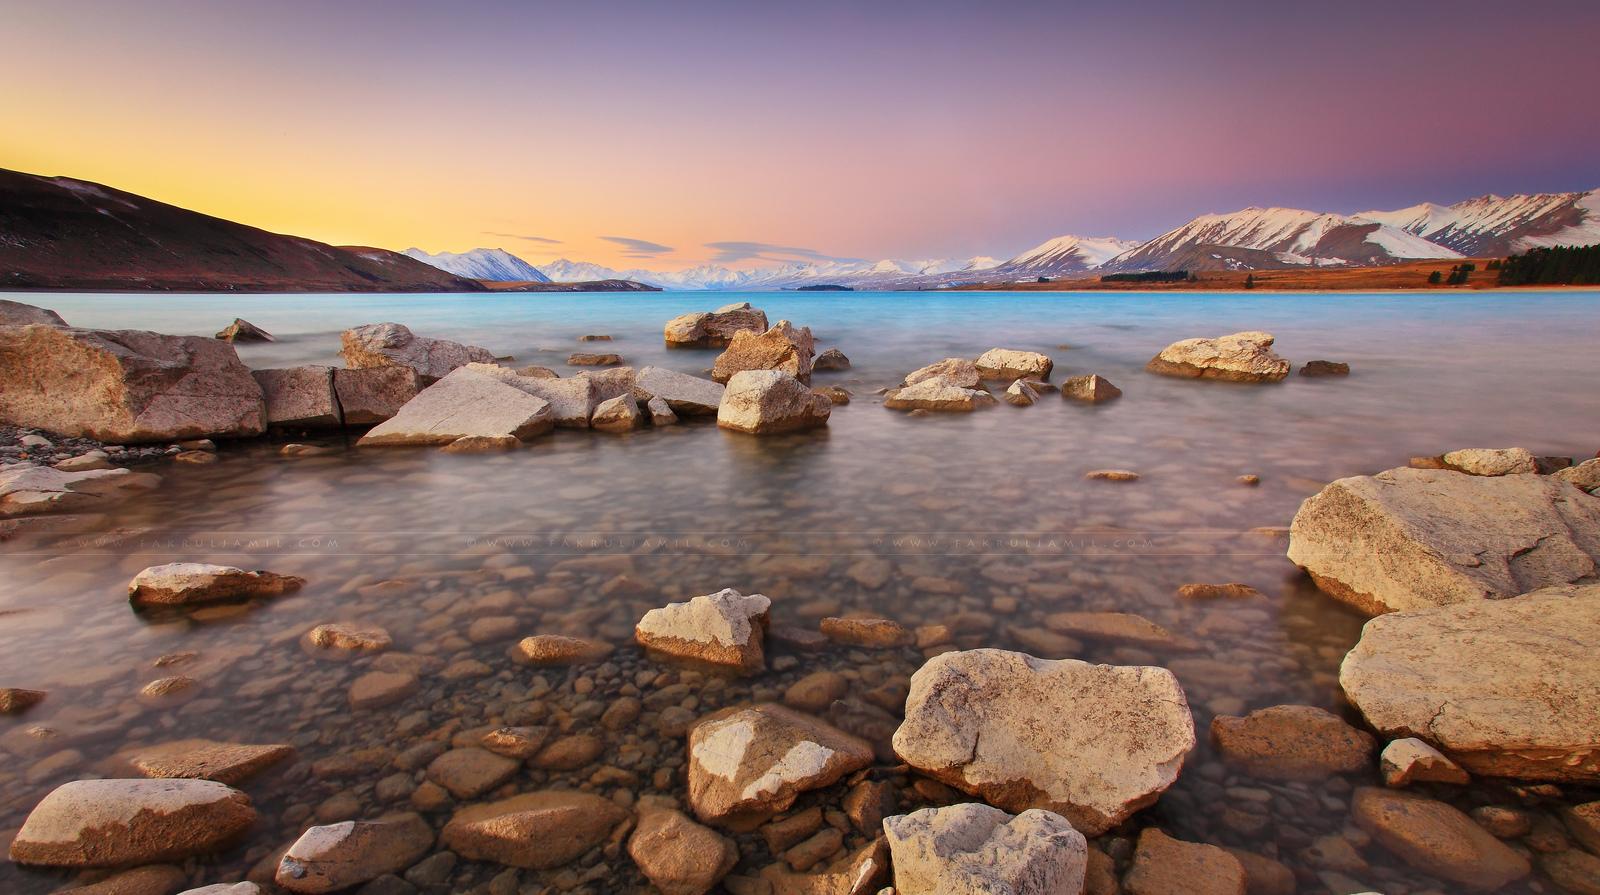 Everlasting Beauty of Lake Tekapo